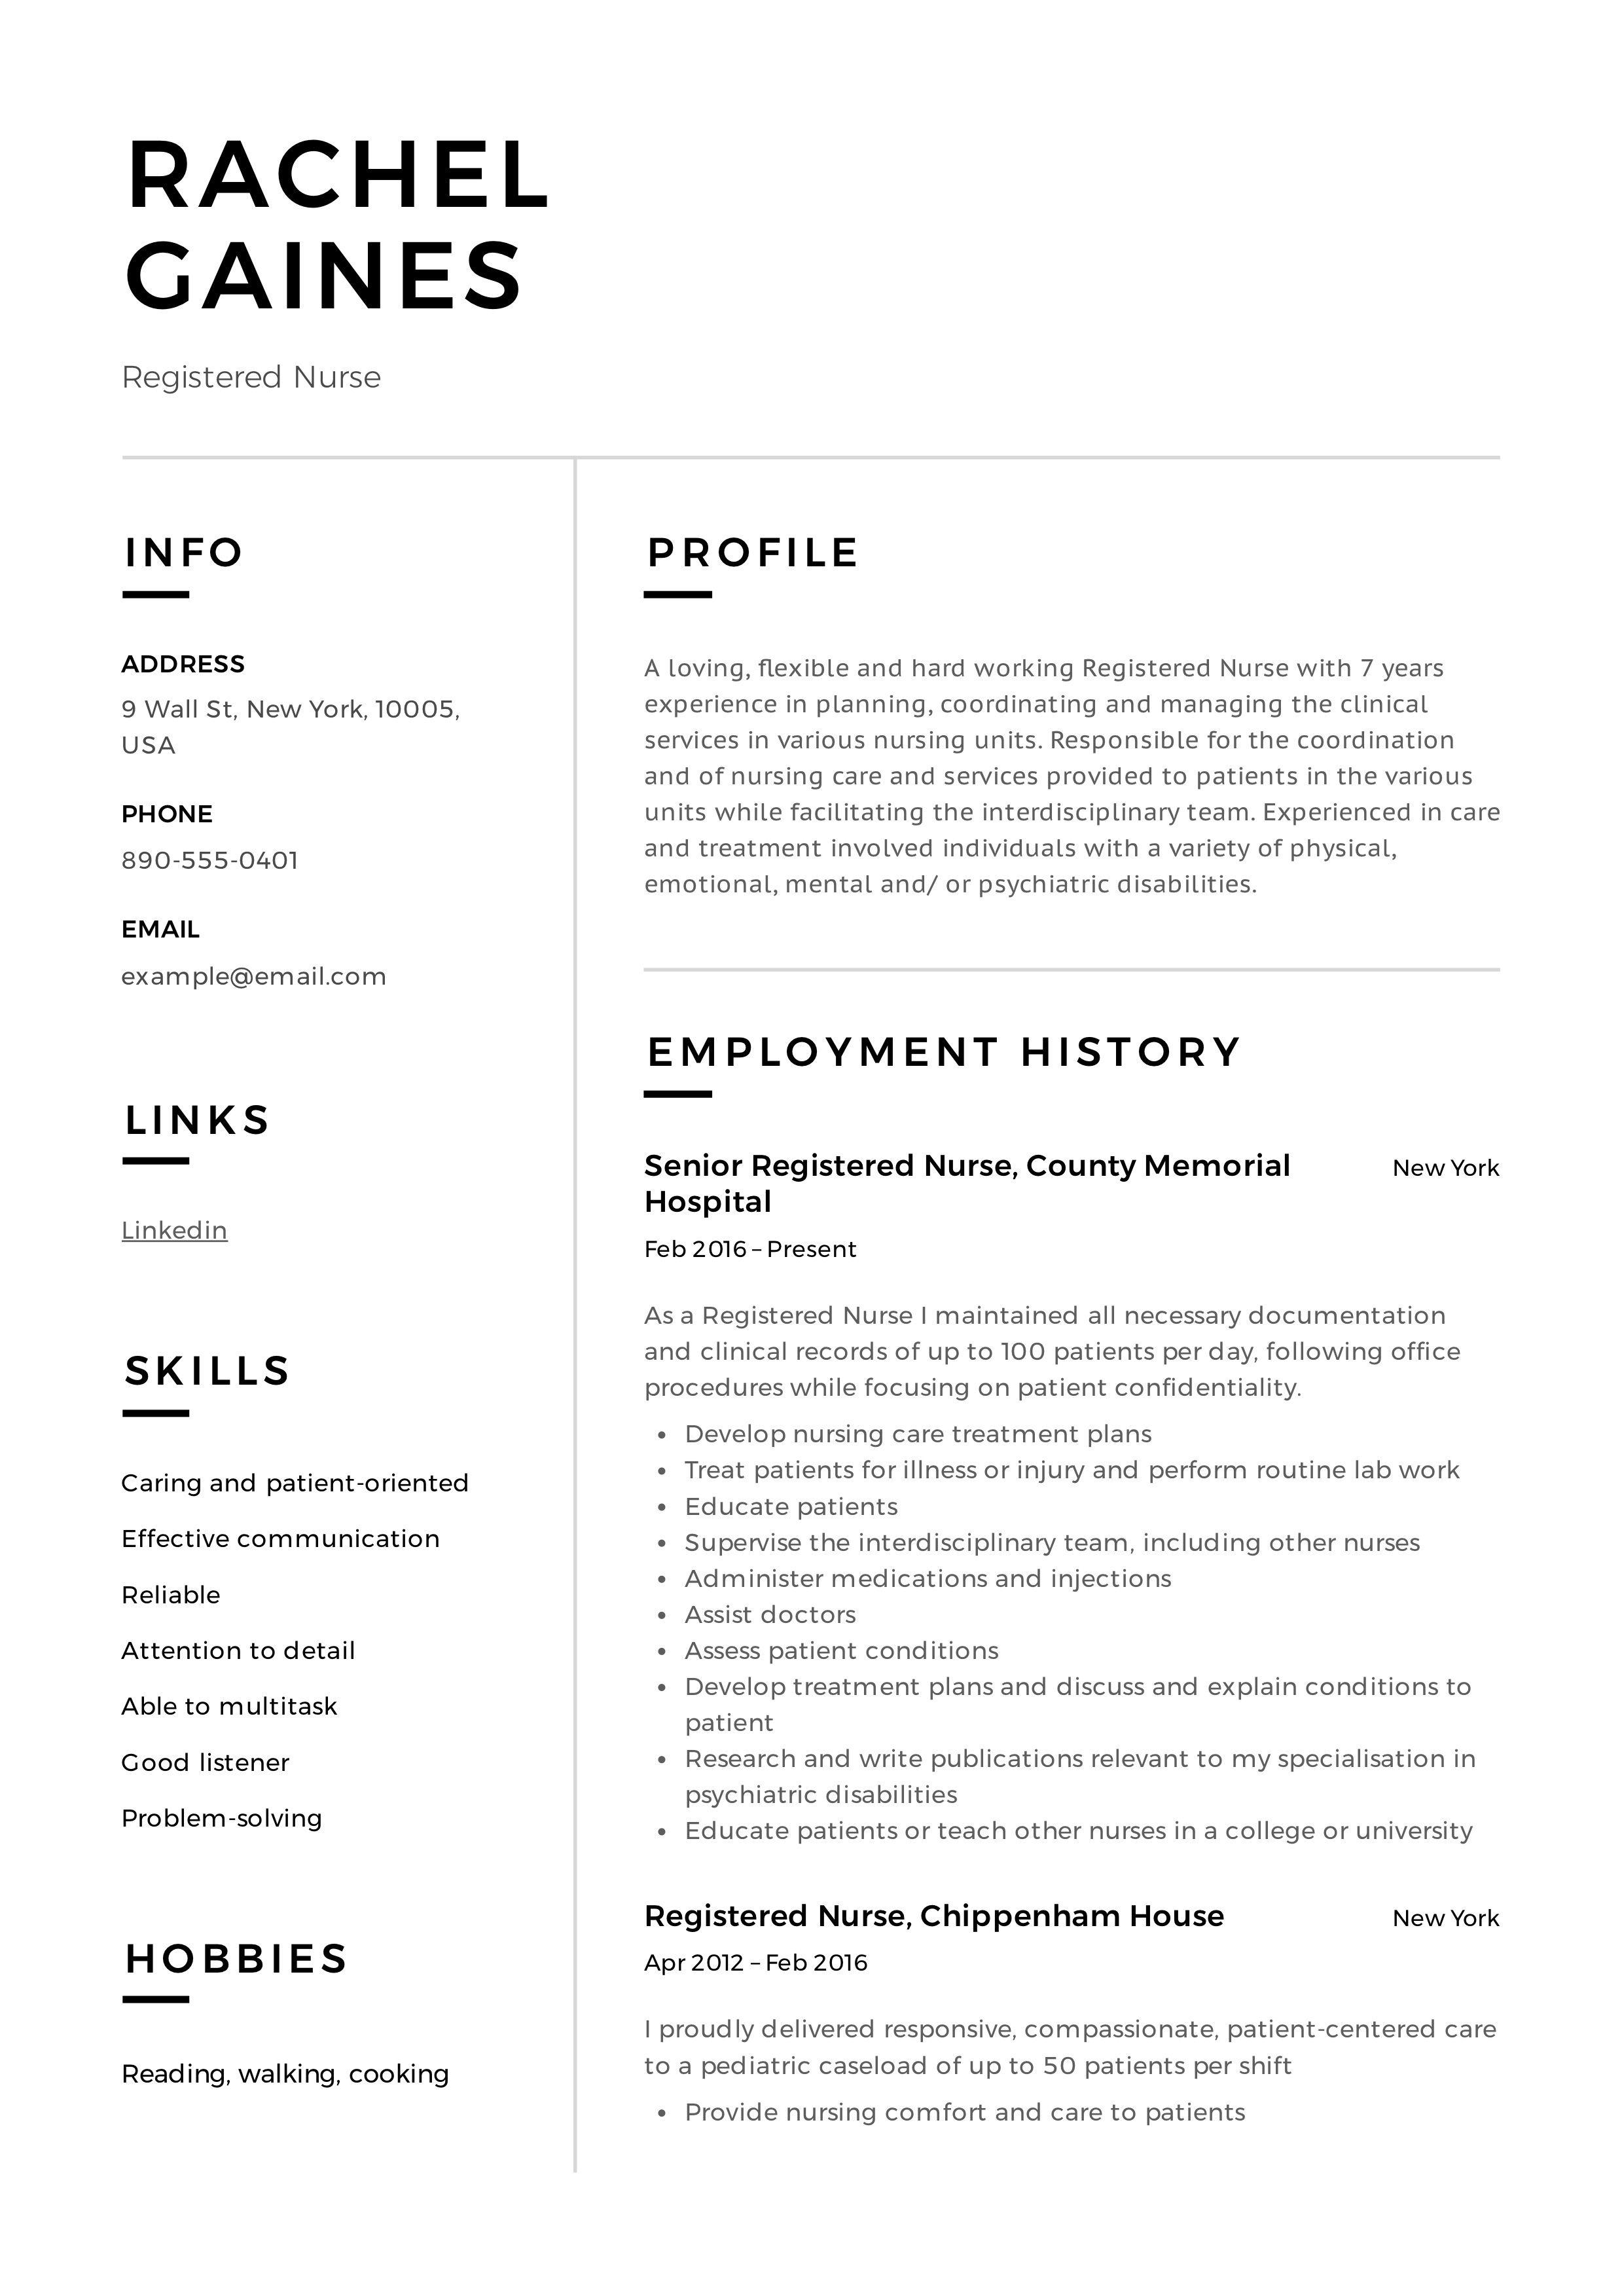 Registered Nurse Resume Sample Nursing Resume Examples Nursing Resume Template Registered Nurse Resume